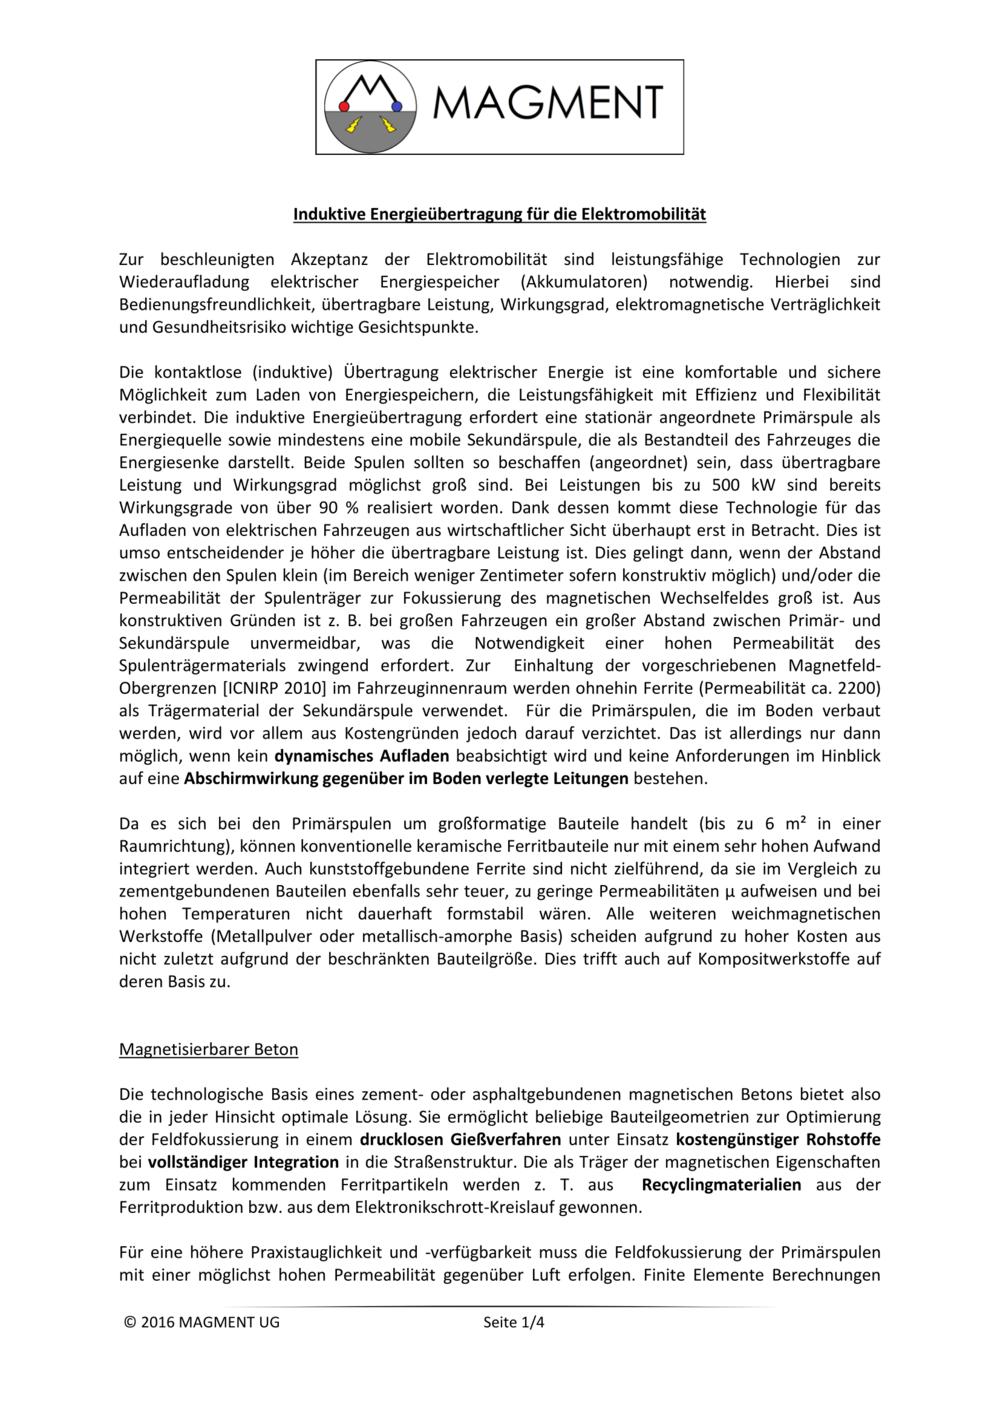 Induktive_Energieübertragung_mit_MAGMENT-1.png